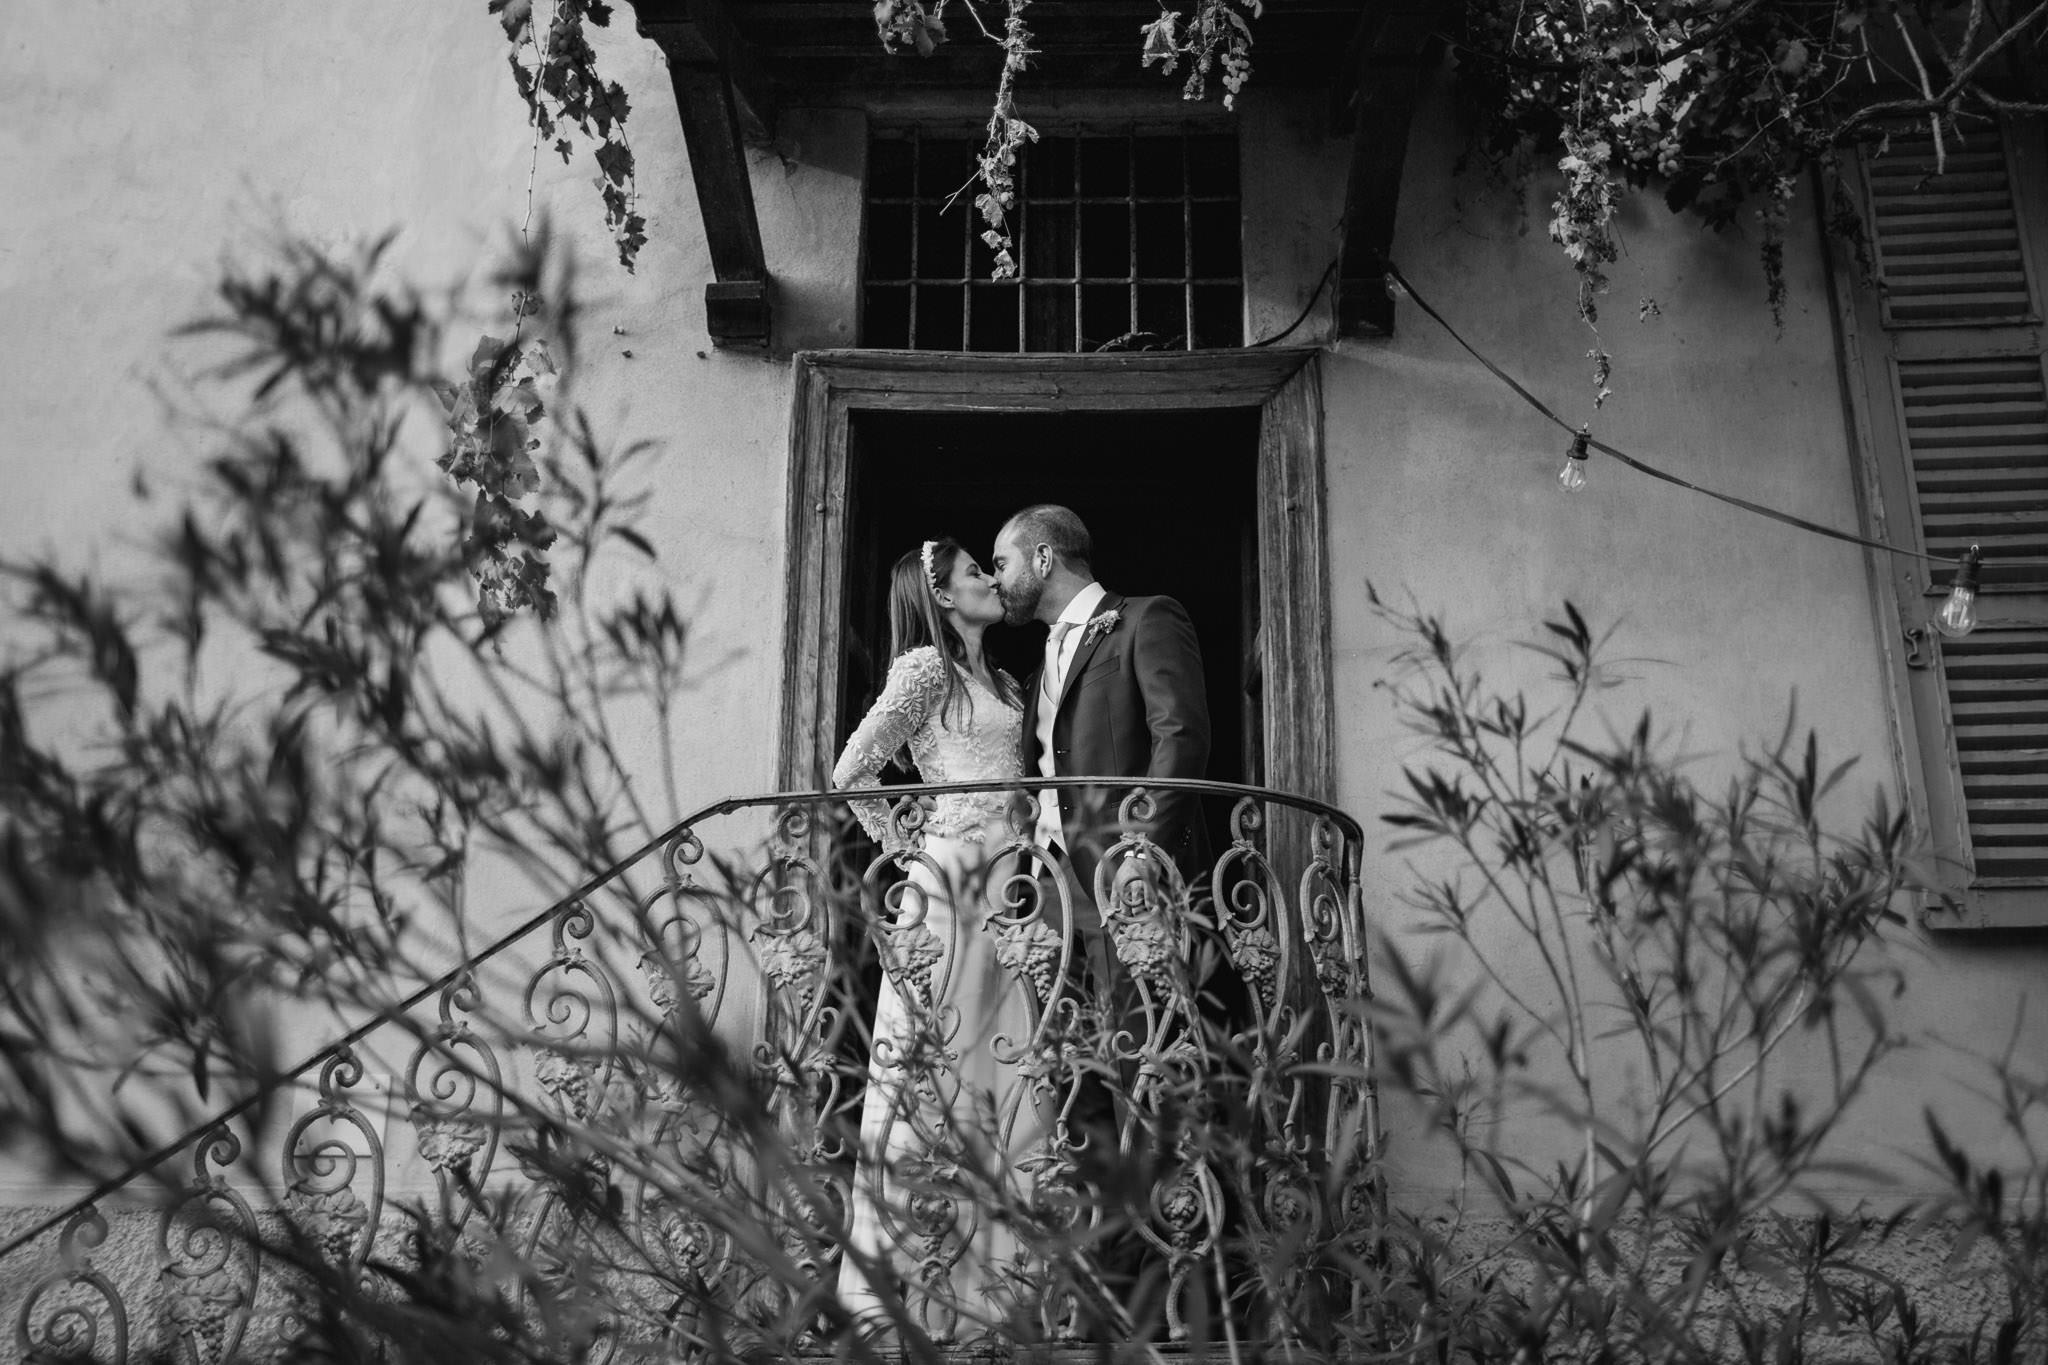 fotografia_di_matrimonio_portfolio-1093